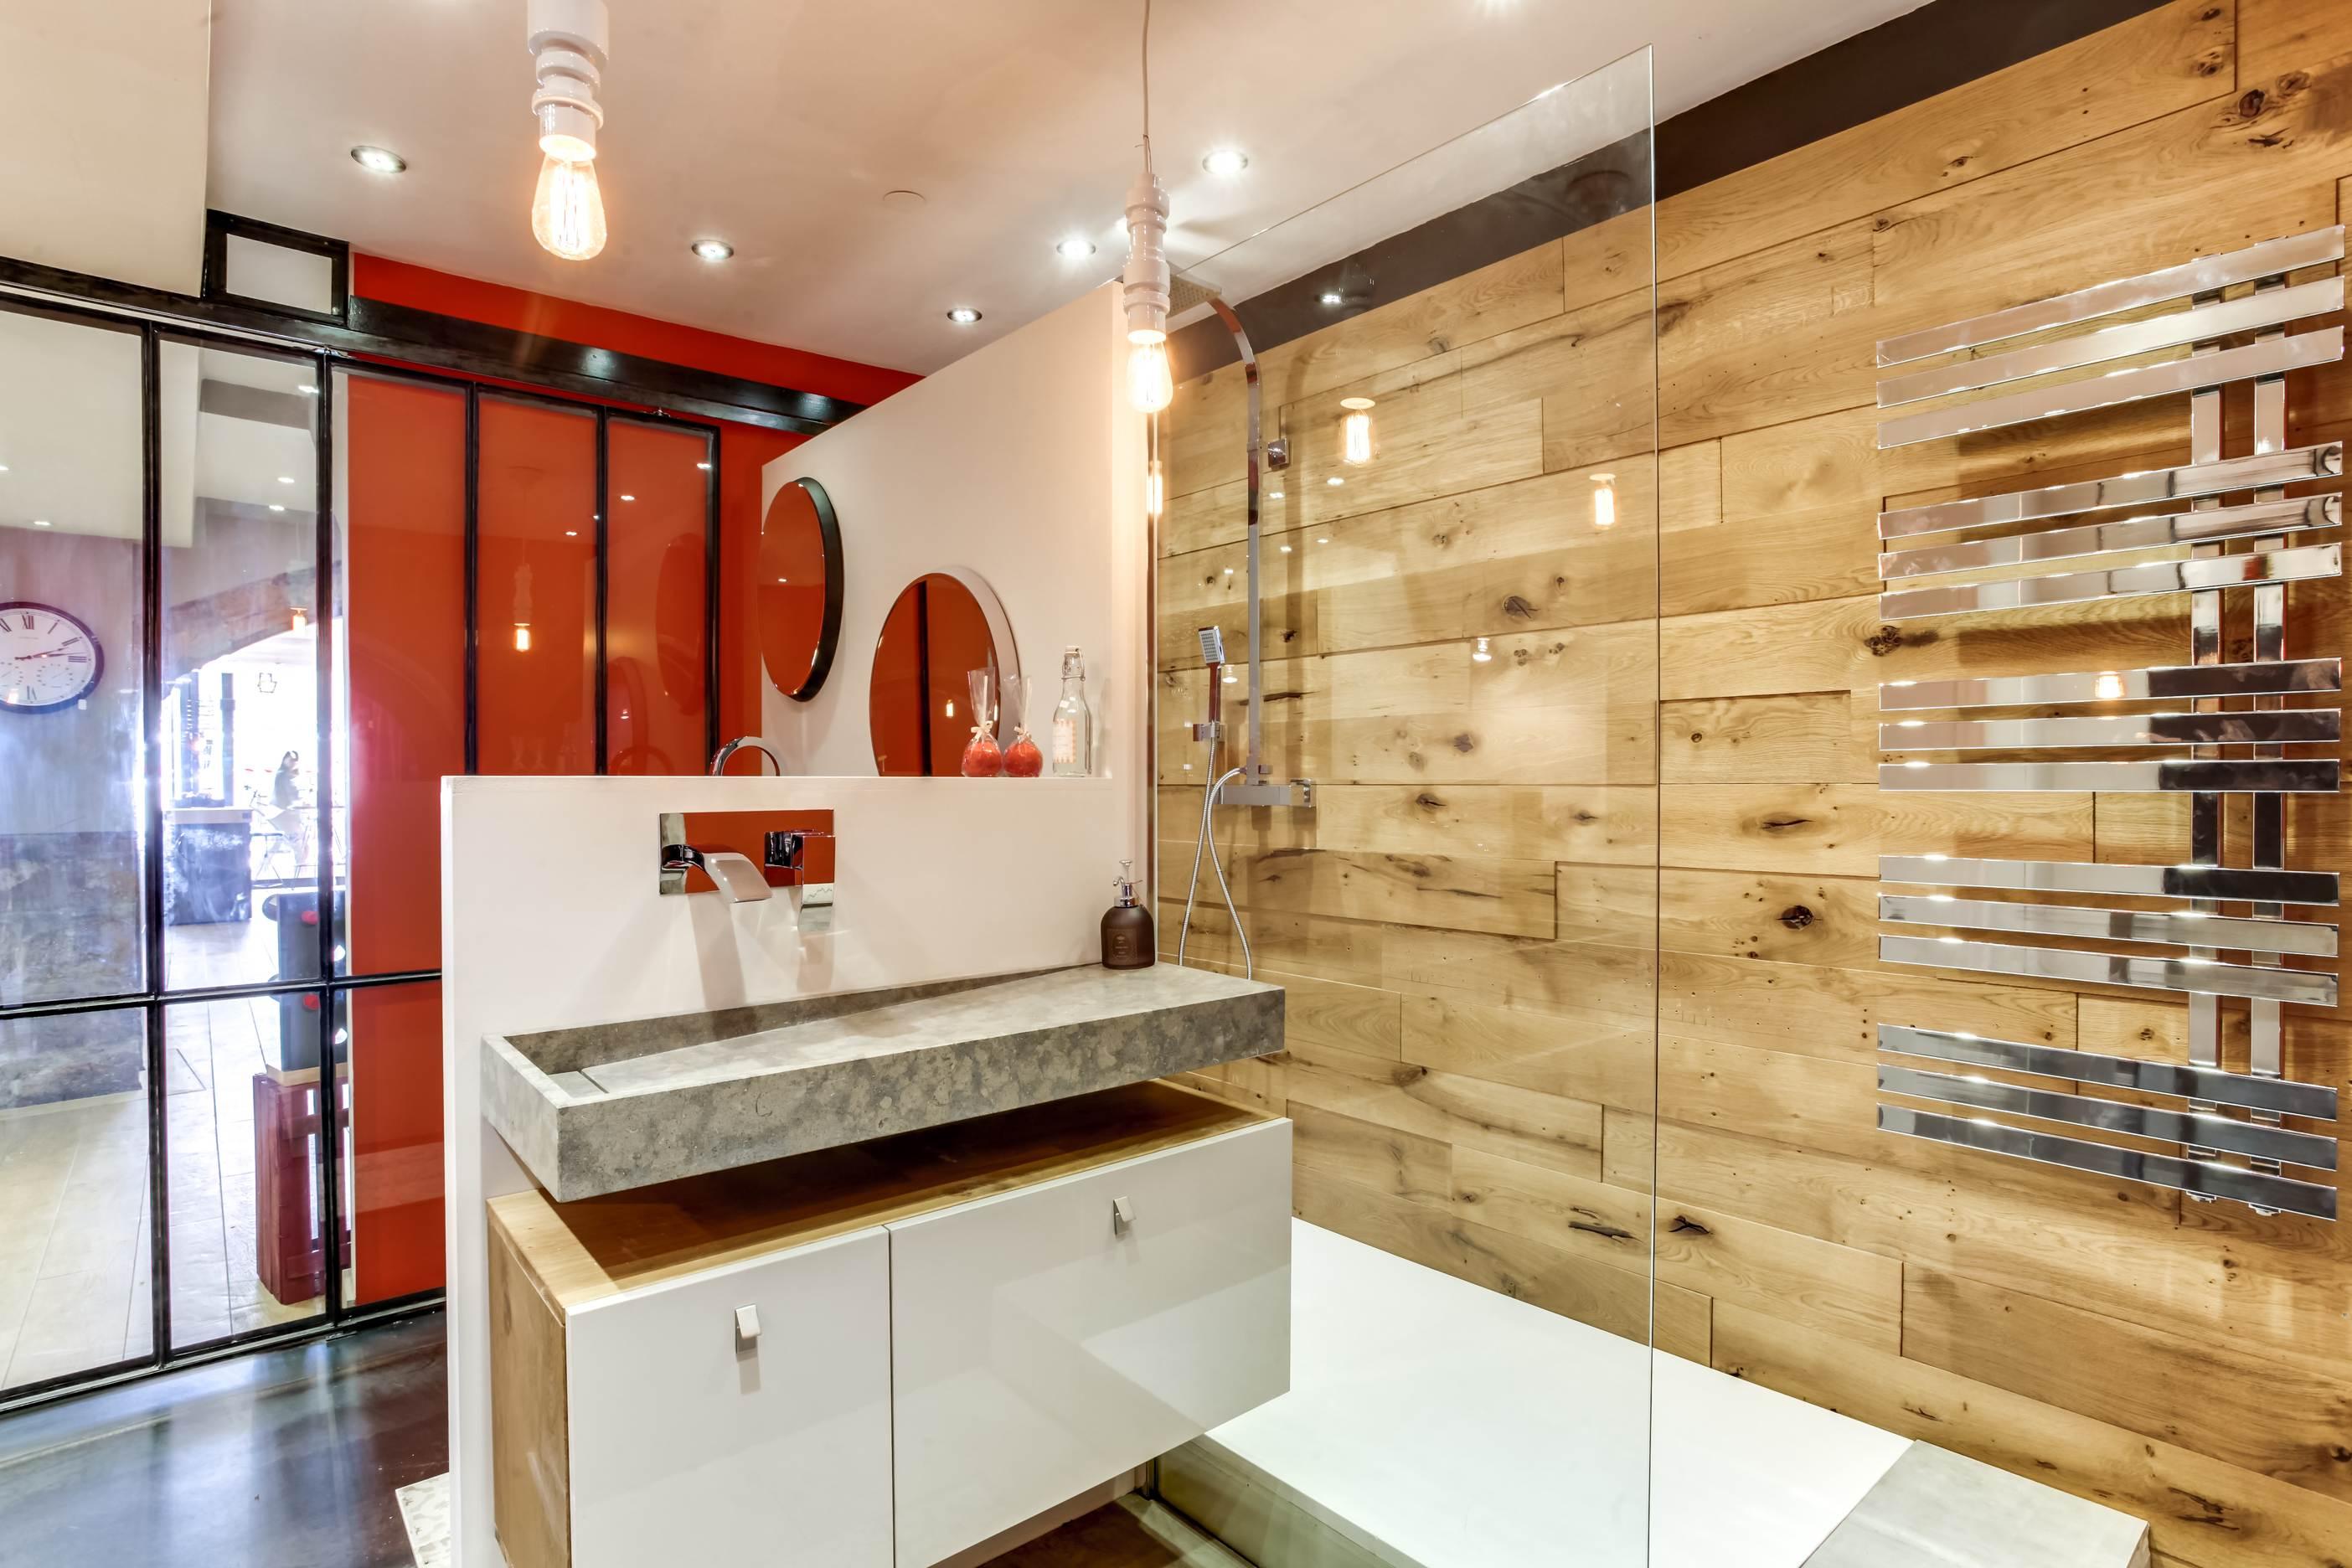 Showroom salle de bain lyon fabulous showroom salle de - Showroom salle de bain ...